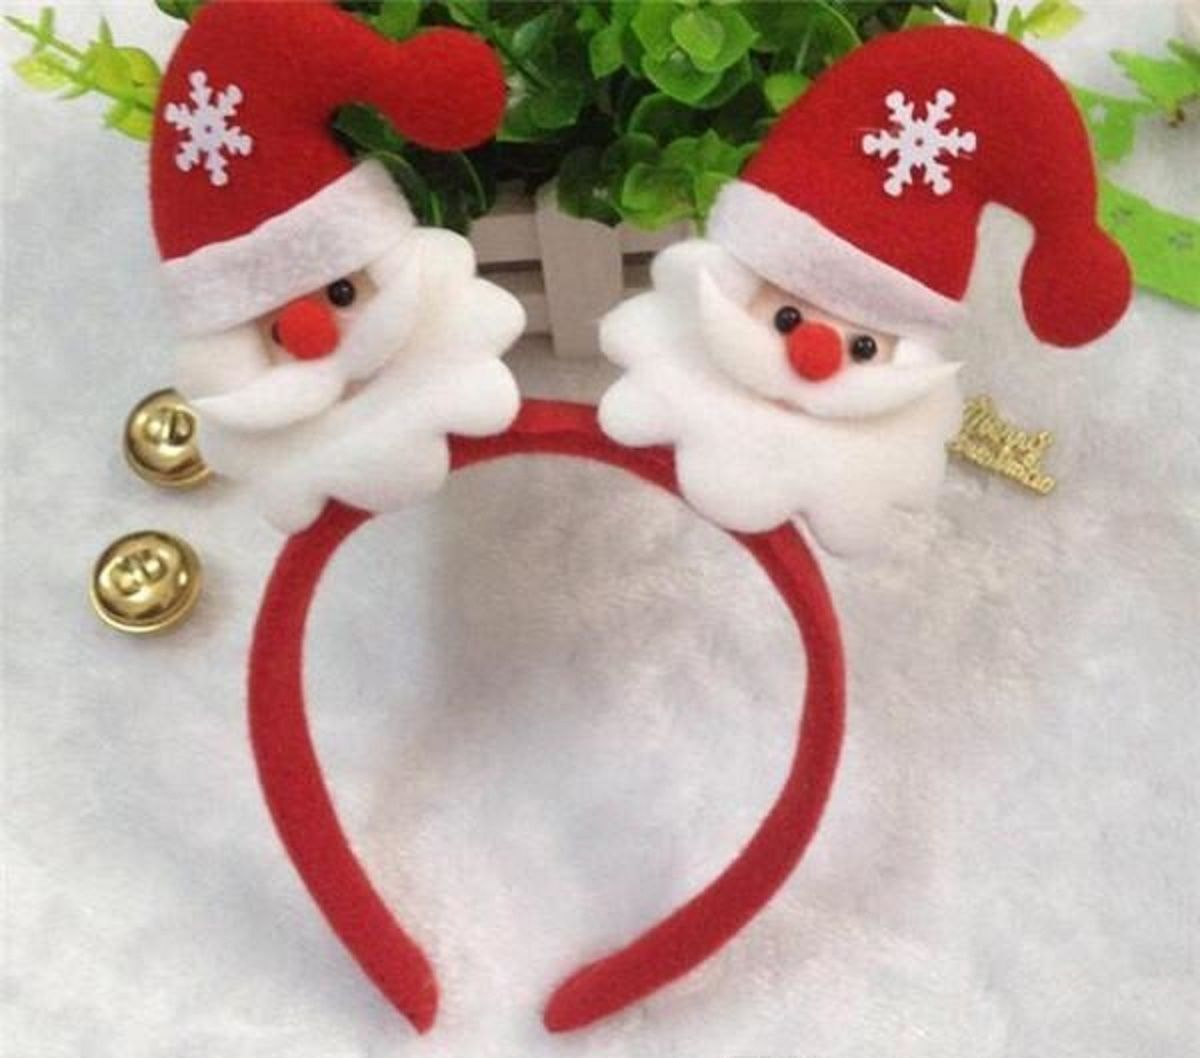 Christmas LED Light Hair Band Headband Accessories